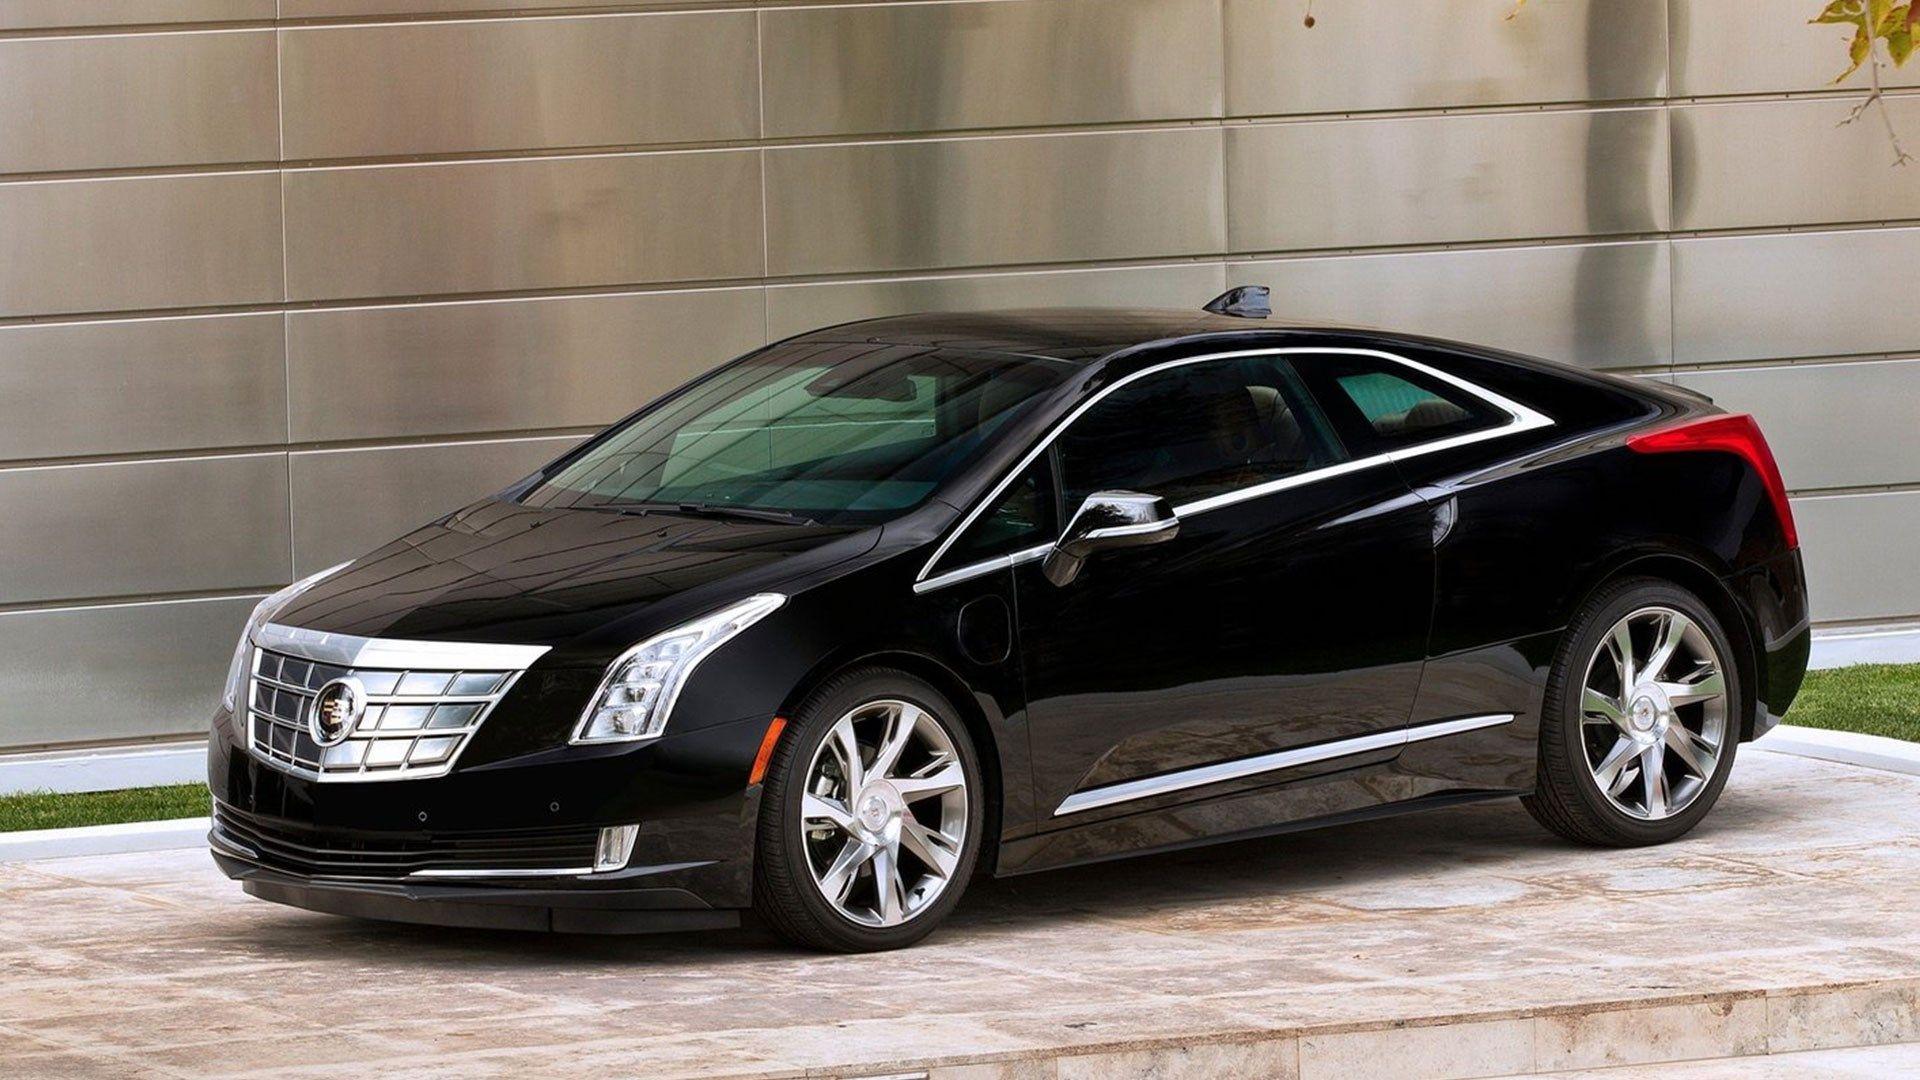 2019 cadillac ats v coupe engine review 2017 2018 car reviews latestcarprice pinterest cadillac ats cadillac and coupe